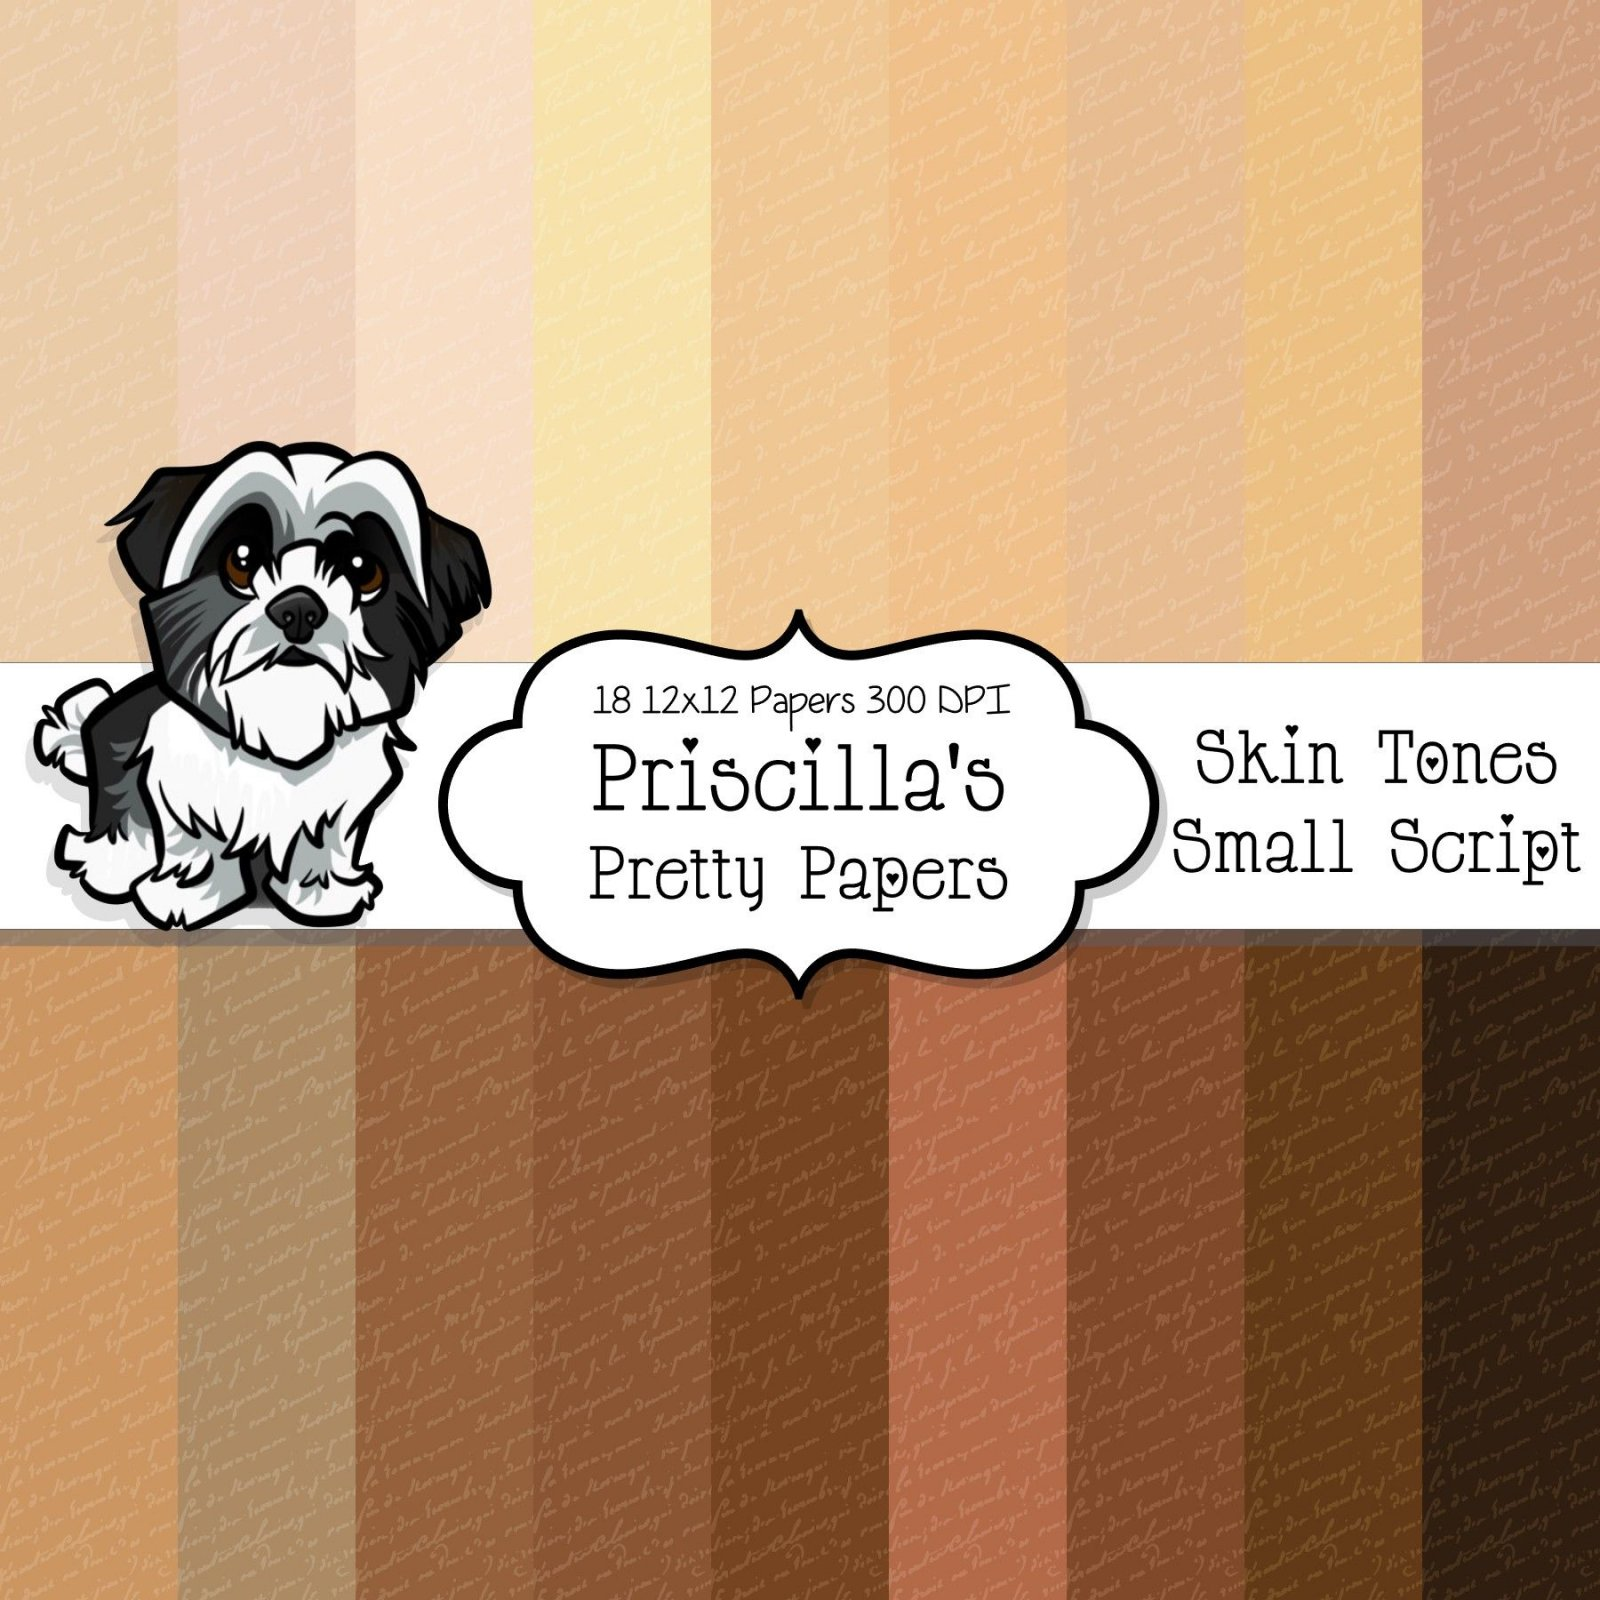 Skin Tones - Small Script digital download